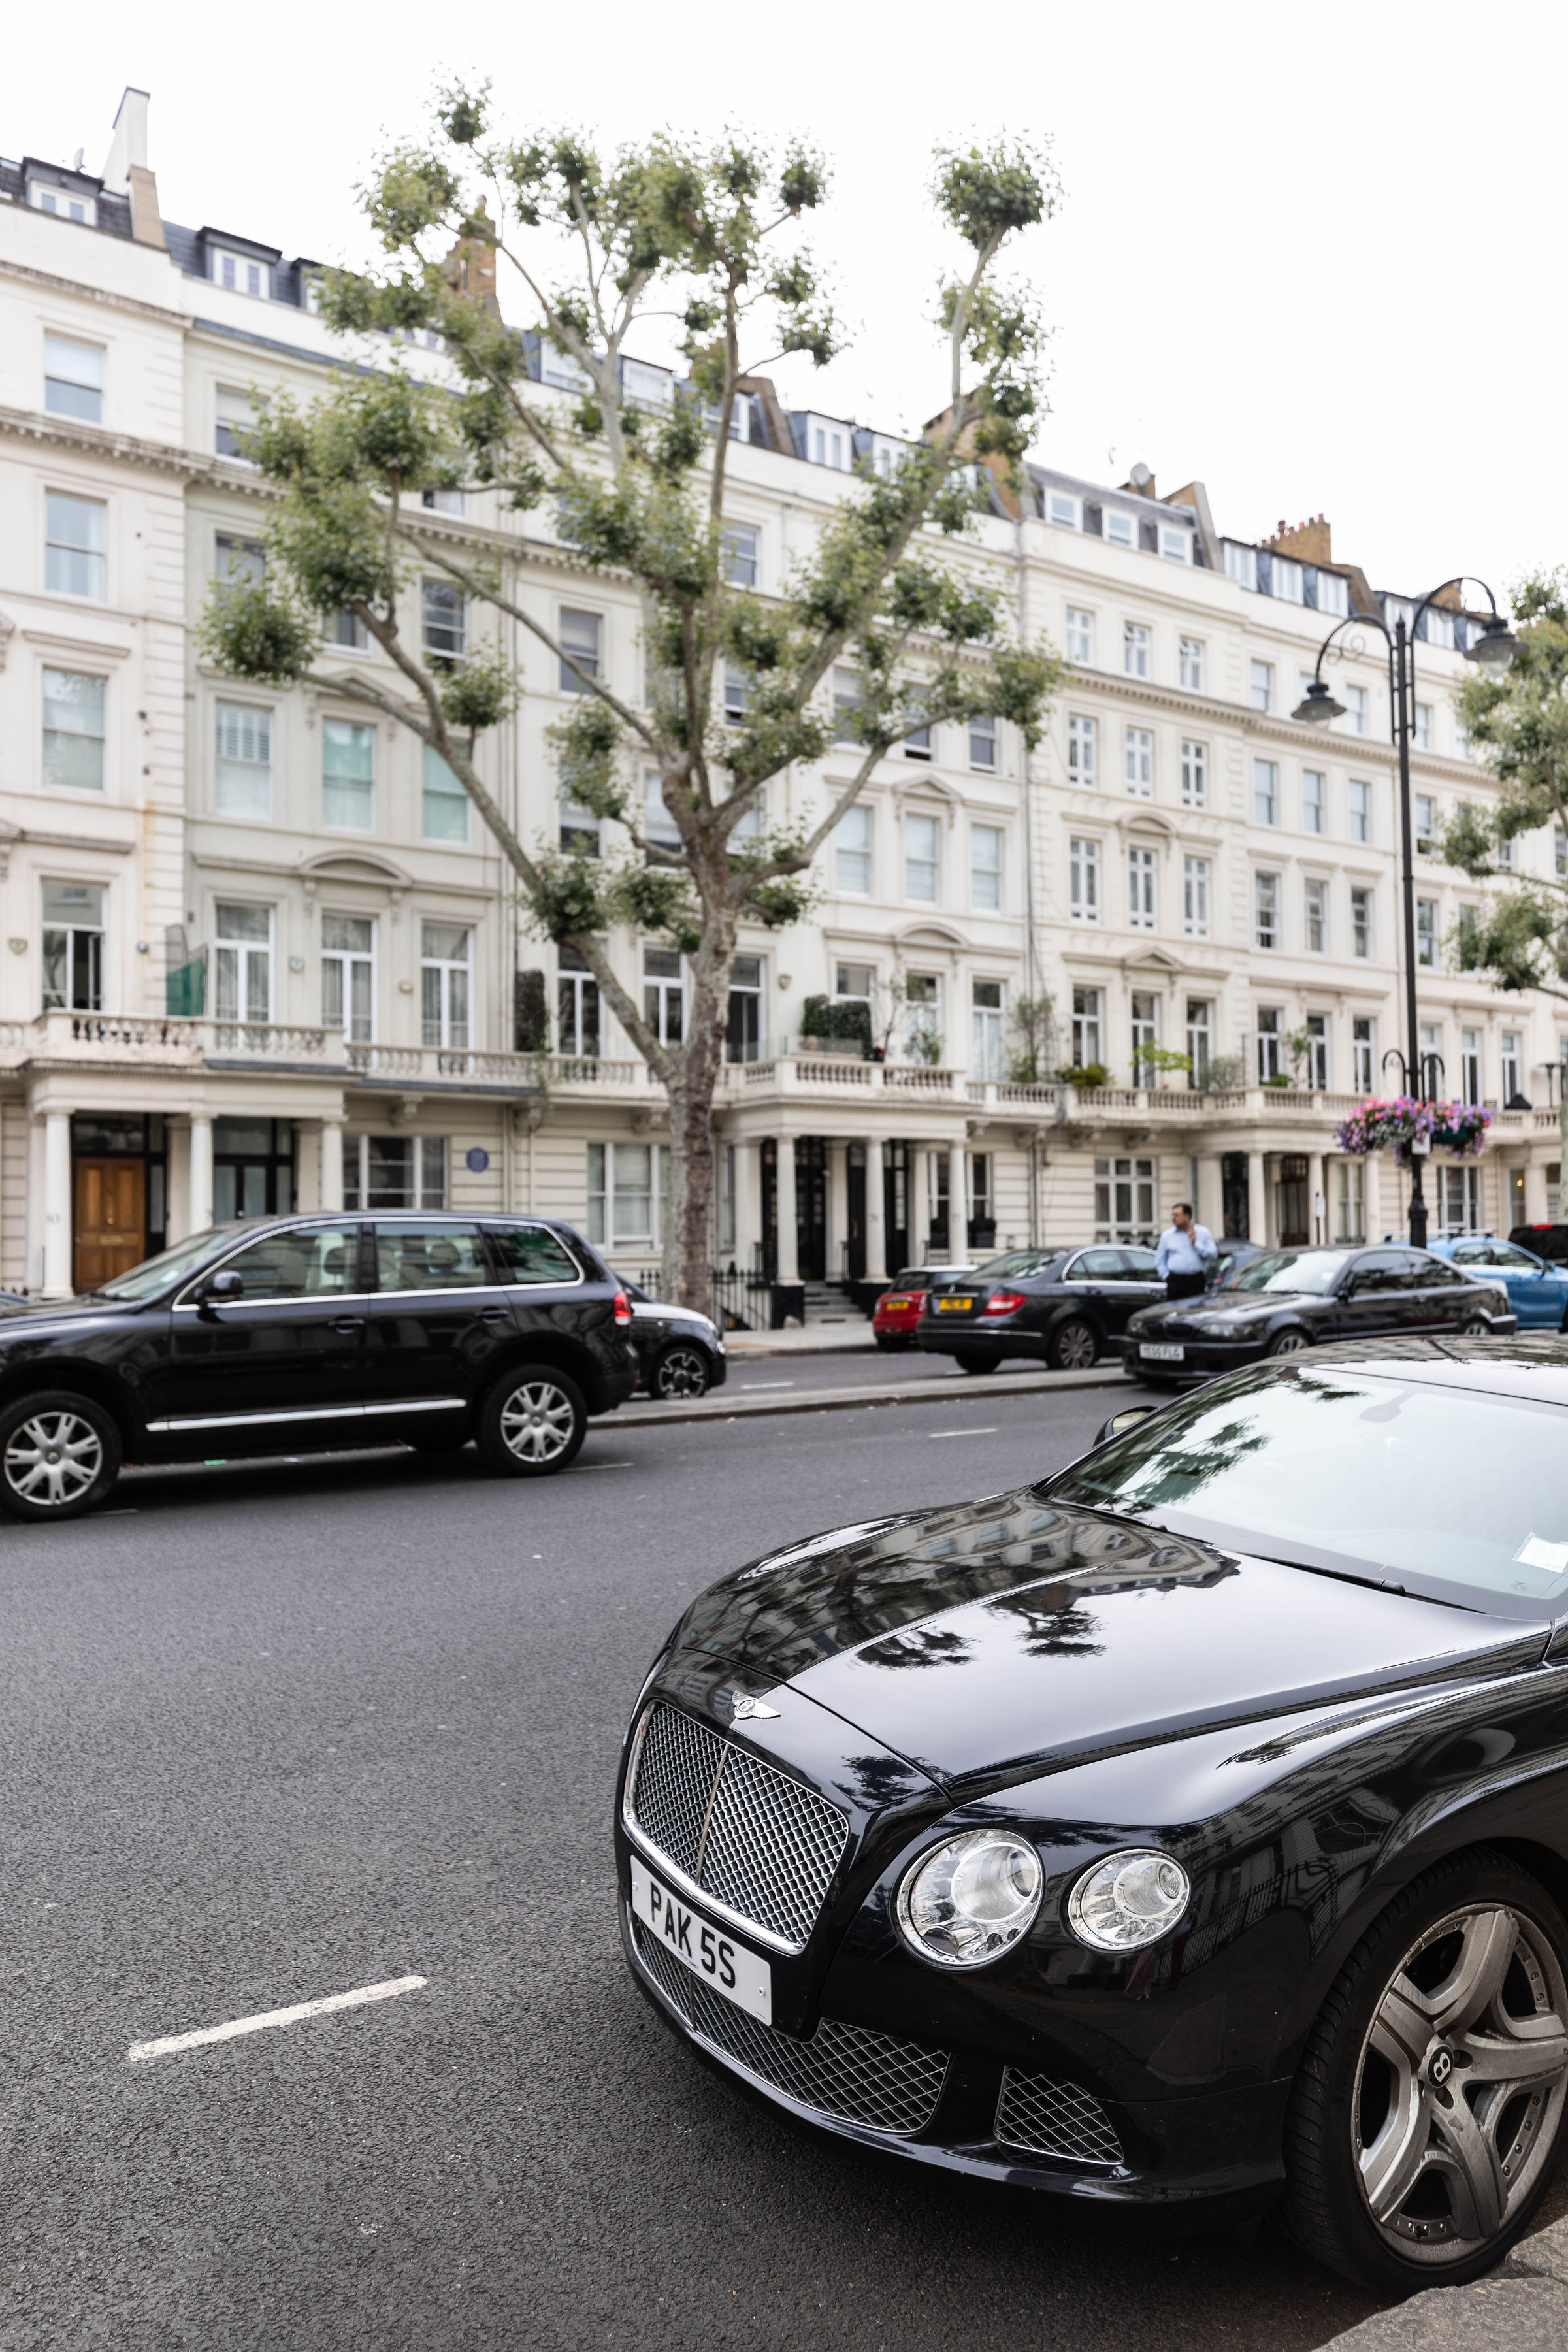 The Kensington Hotel Luxury Hotel in South Kensington, London, United Kingdom, Best Hotels in England United Kingdom Luxury Accommodations by Annie Fairfax